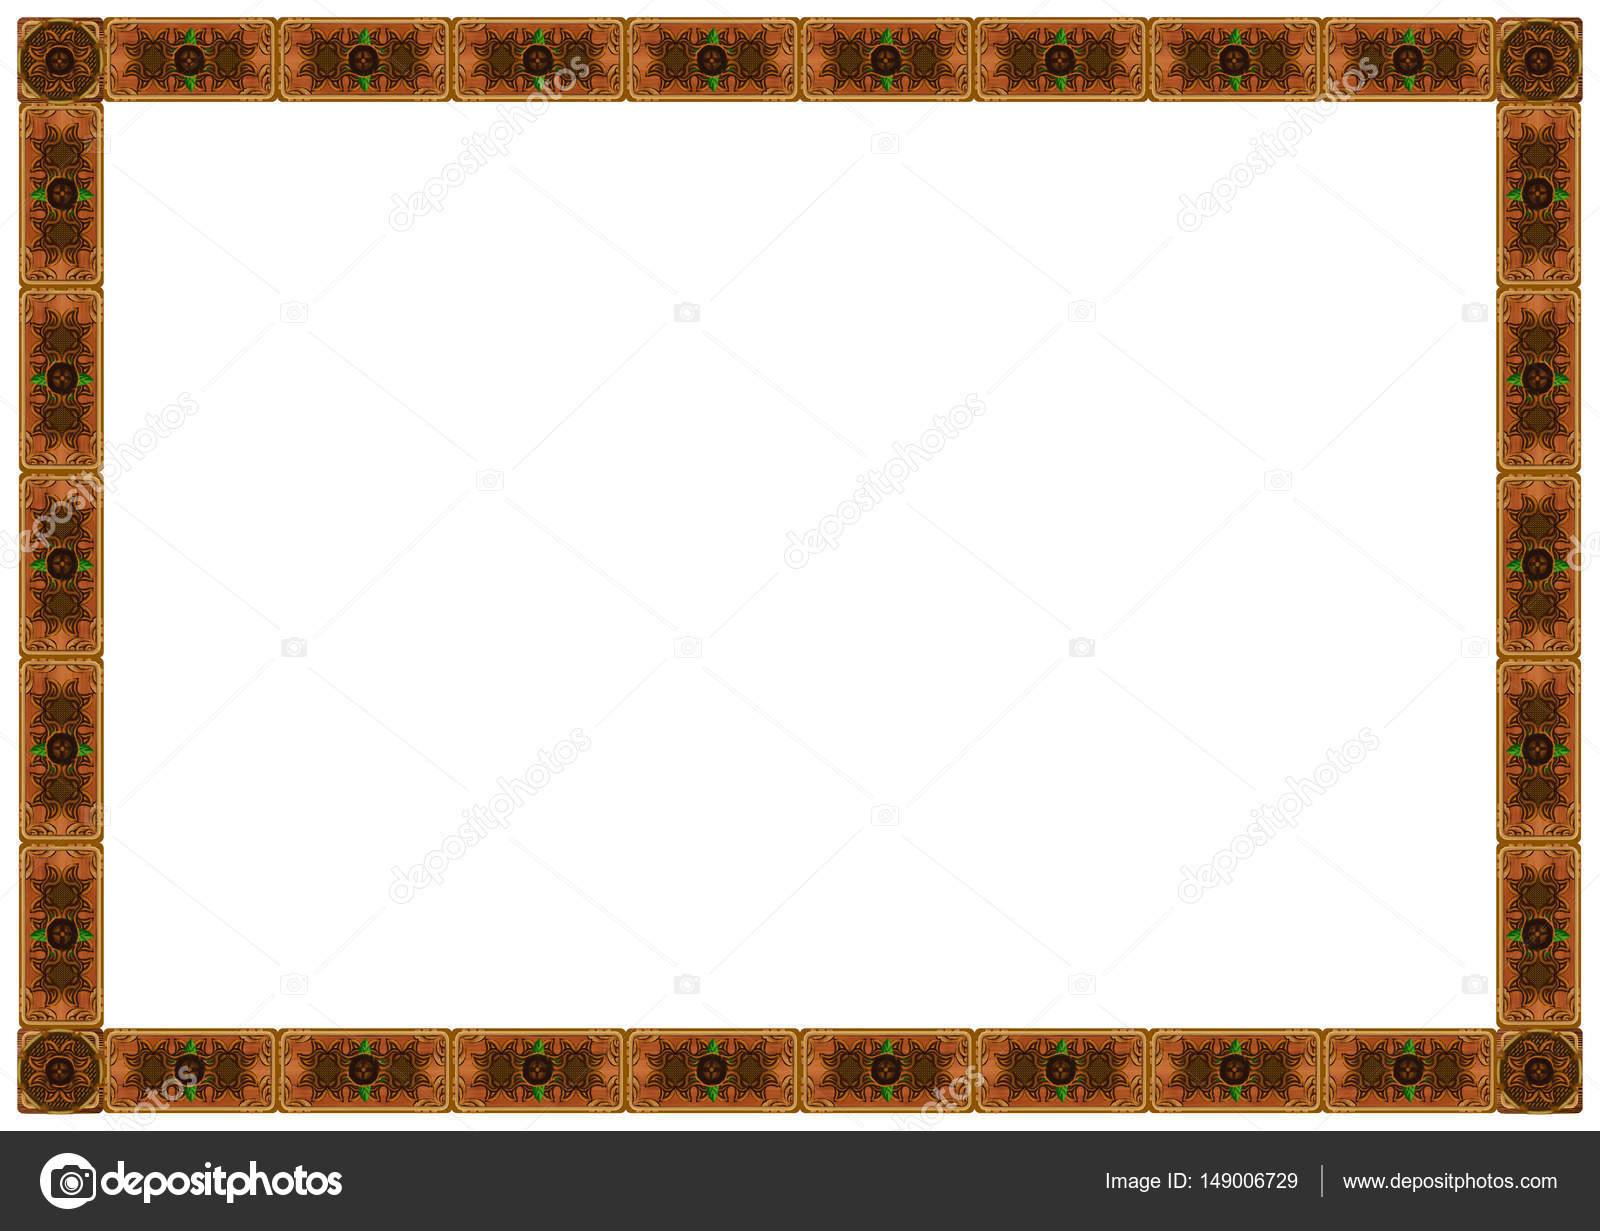 Marco de madera exquisitos ornamentos tallados — Foto de stock ...